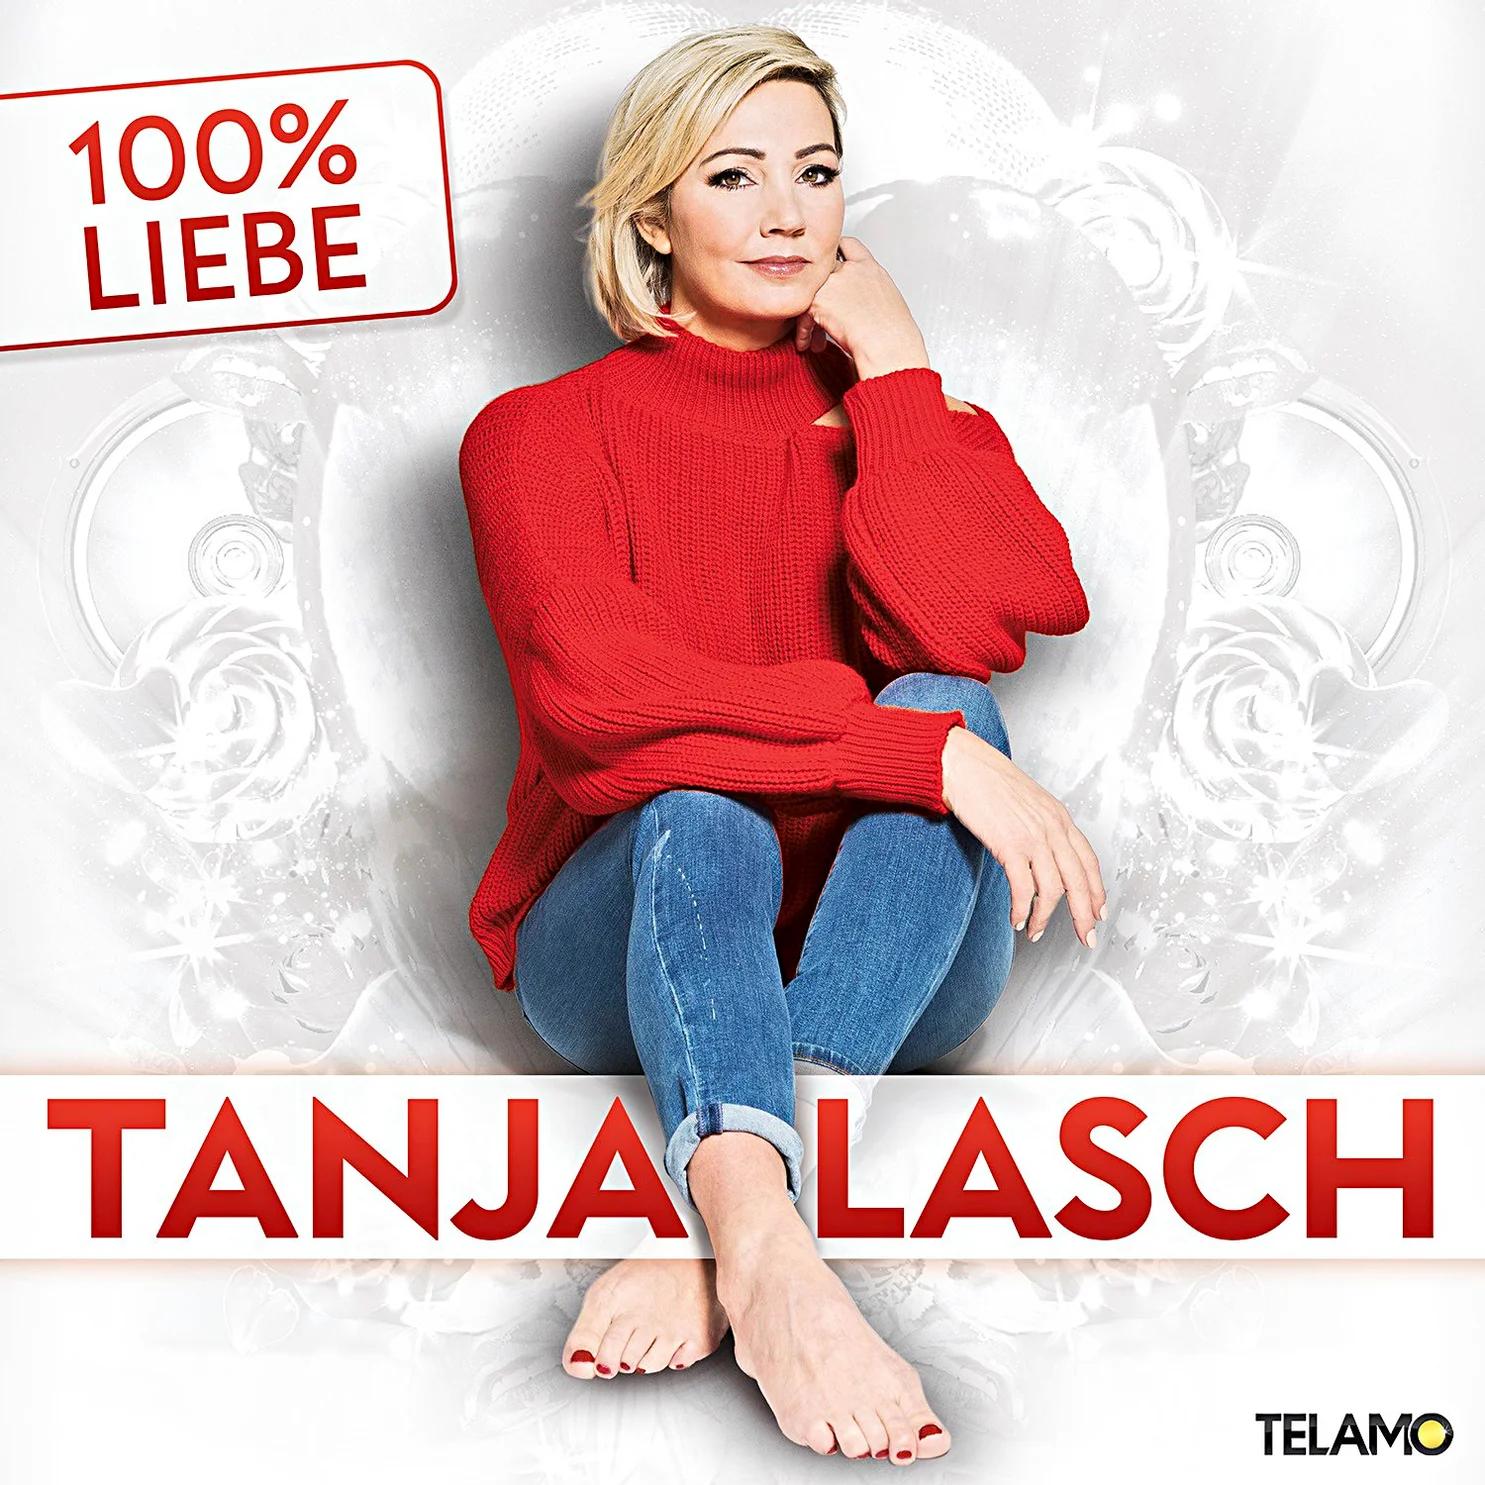 Tanja Lasch - 100% Liebe (2021)